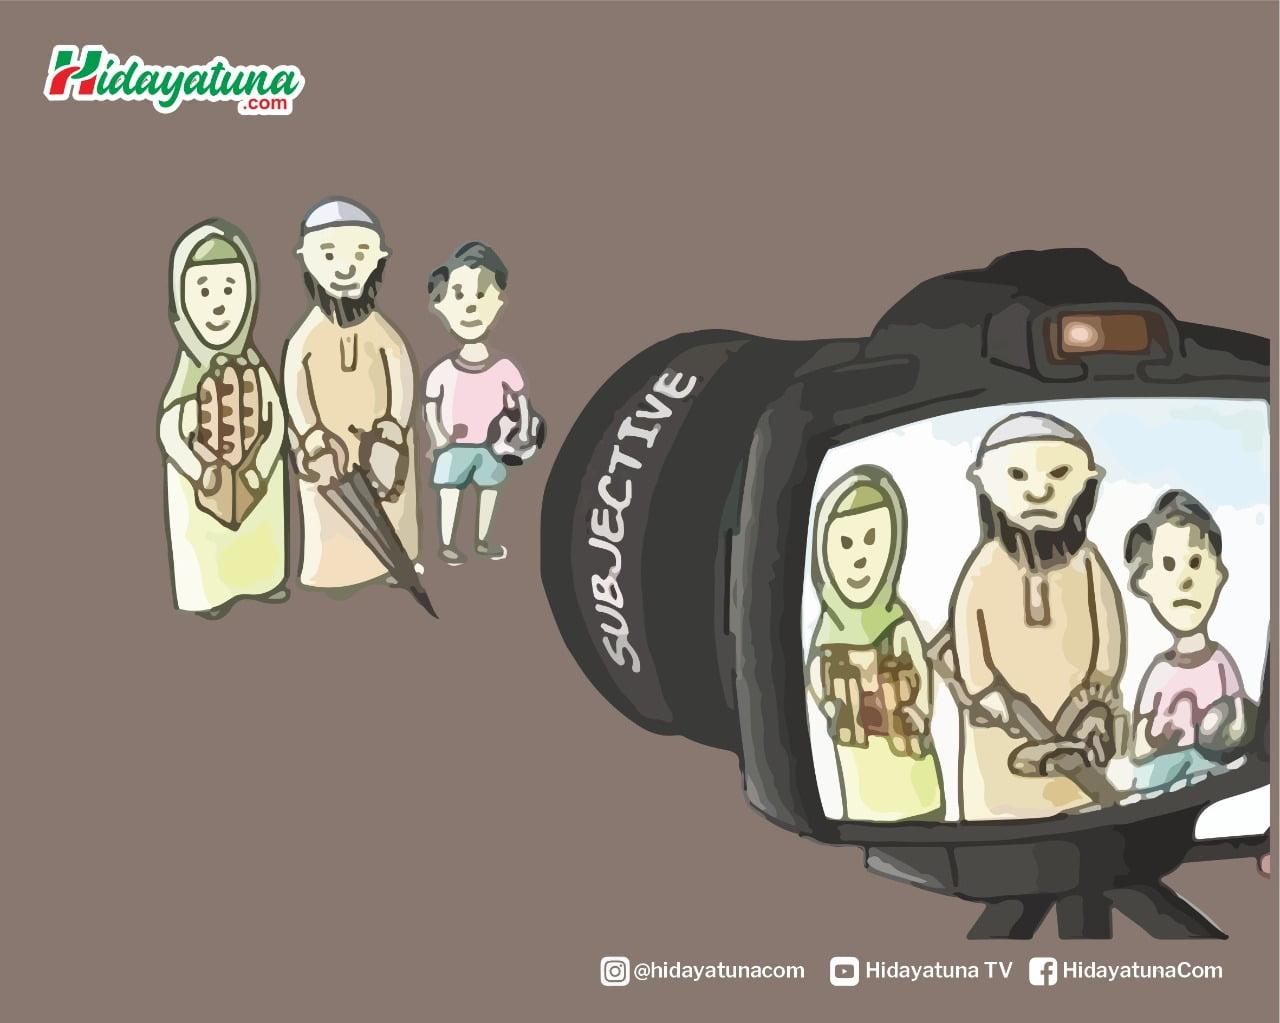 Islamofobia Sasar Muslim AS (Ilustrasi/Hidayatuna)